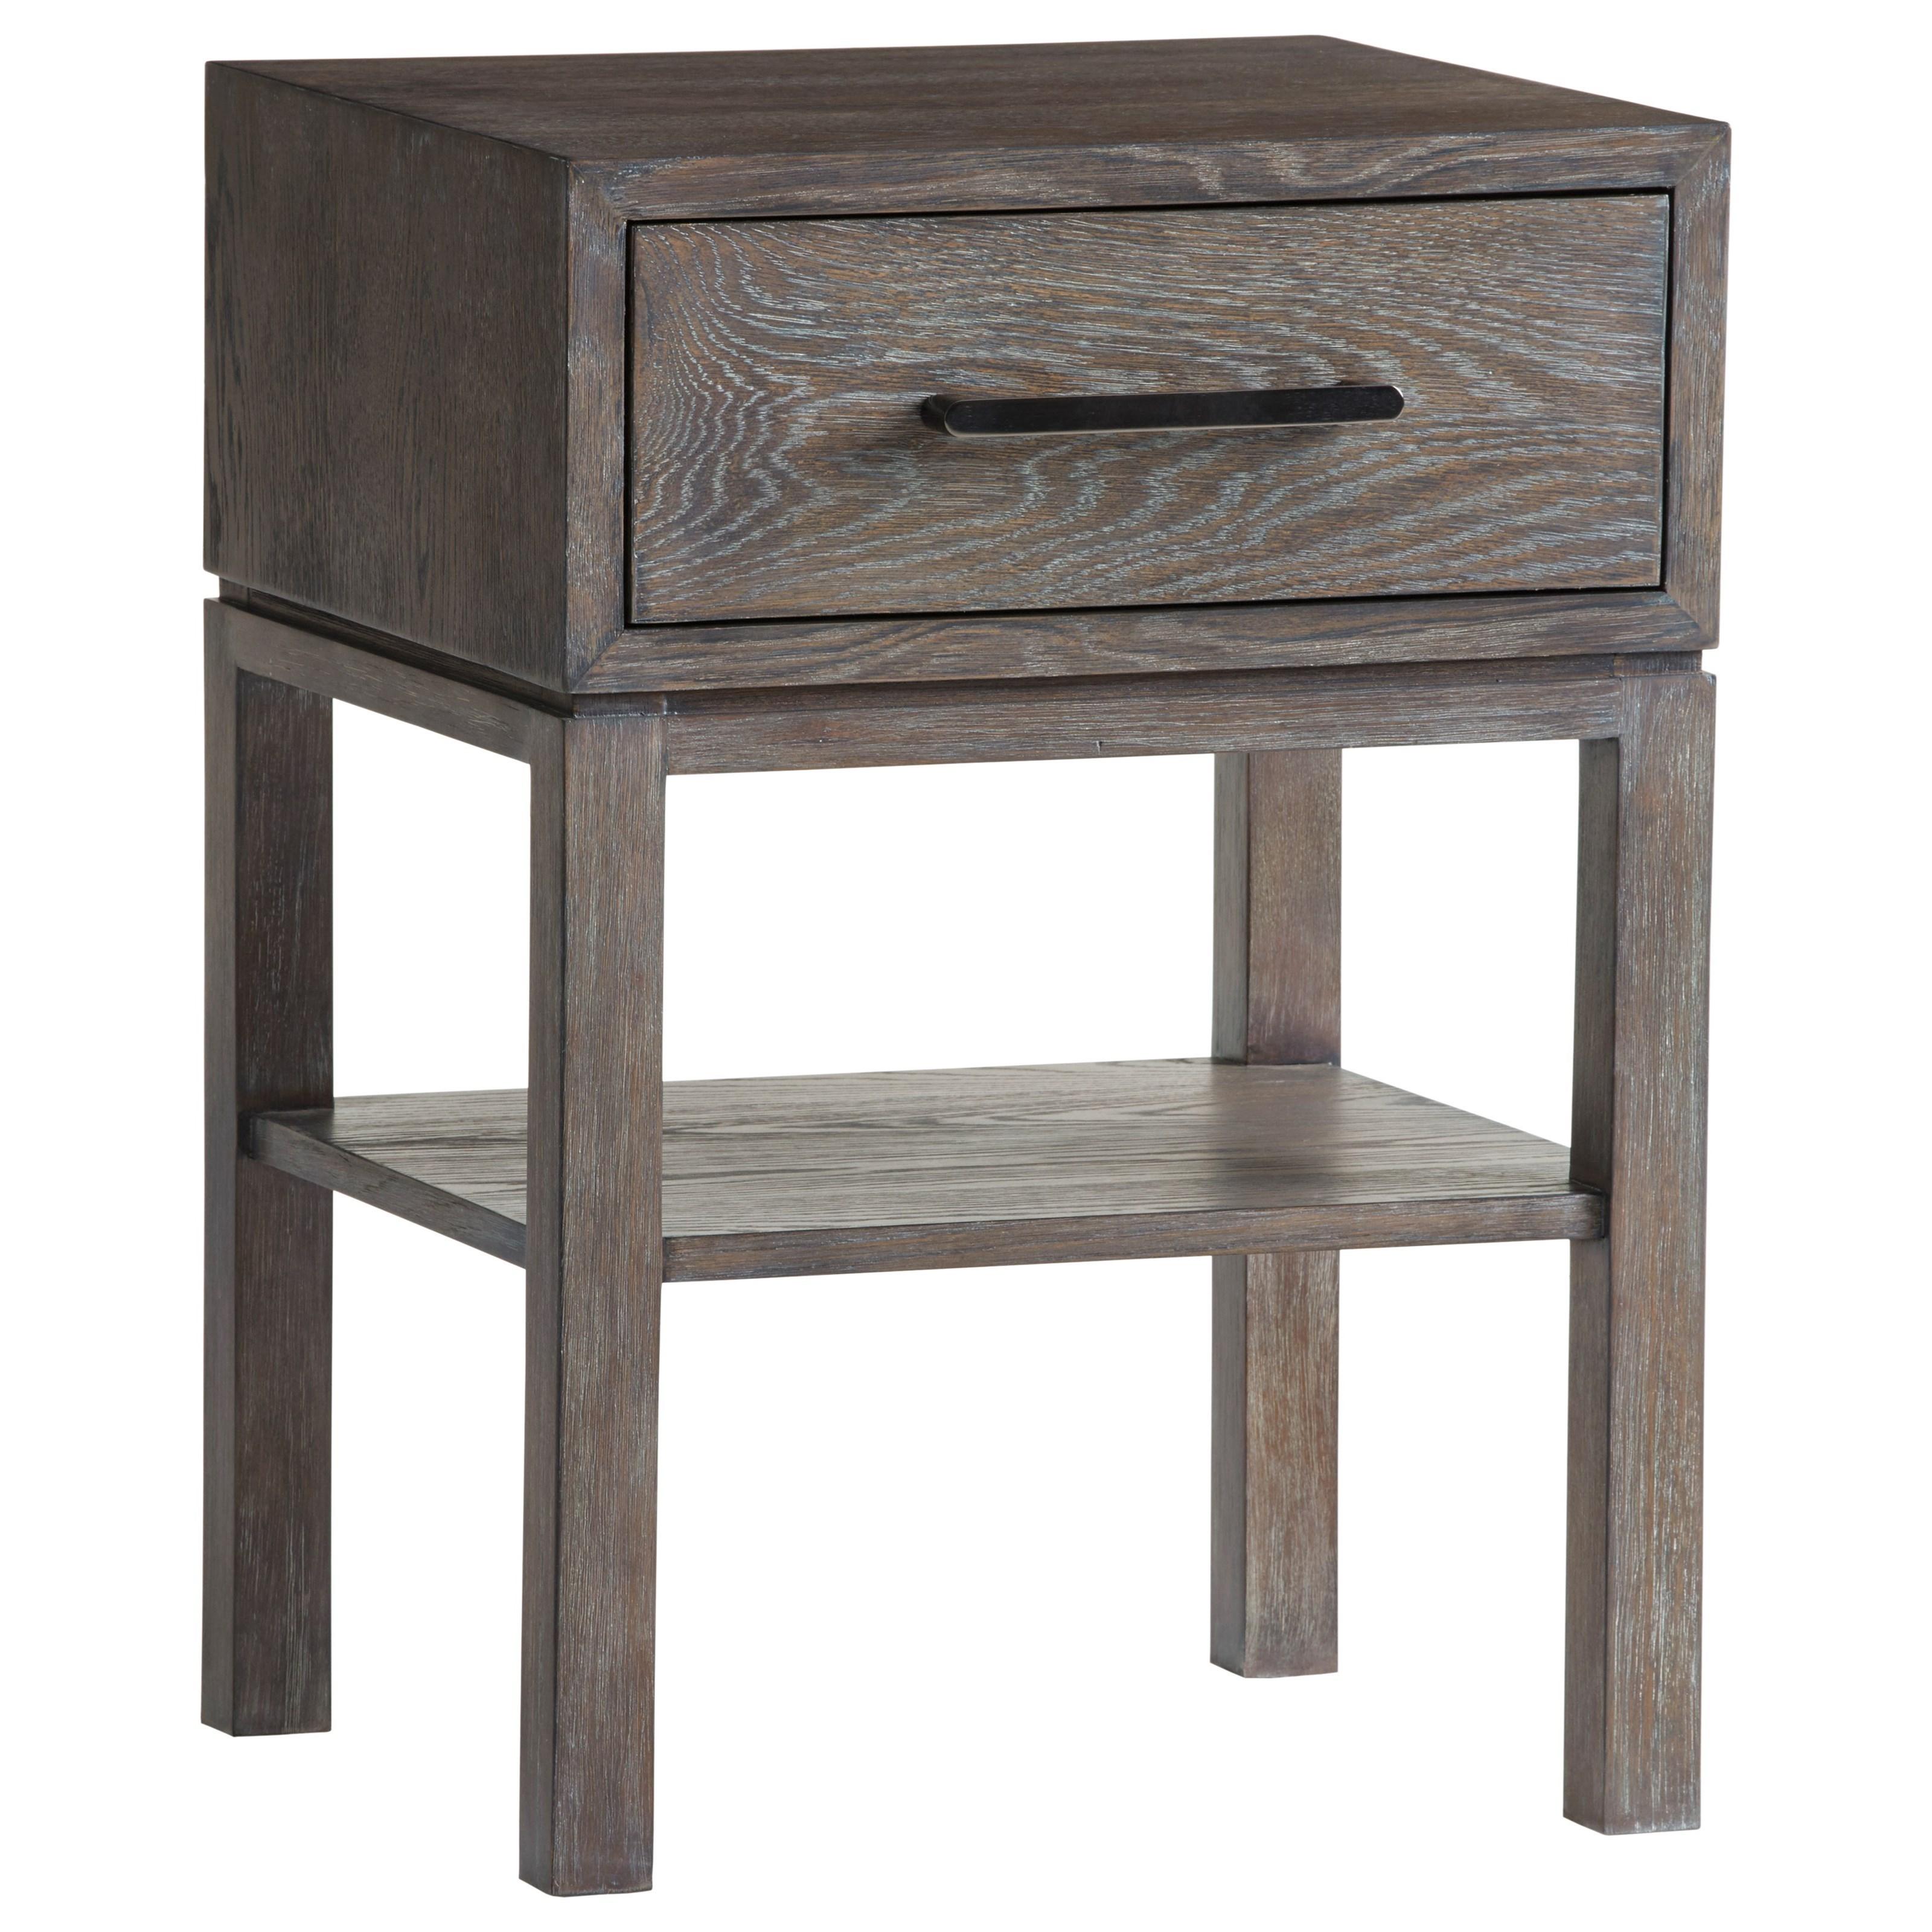 Lexington Santana Armiston 1 Drawer Night Table With 1 Open Shelf